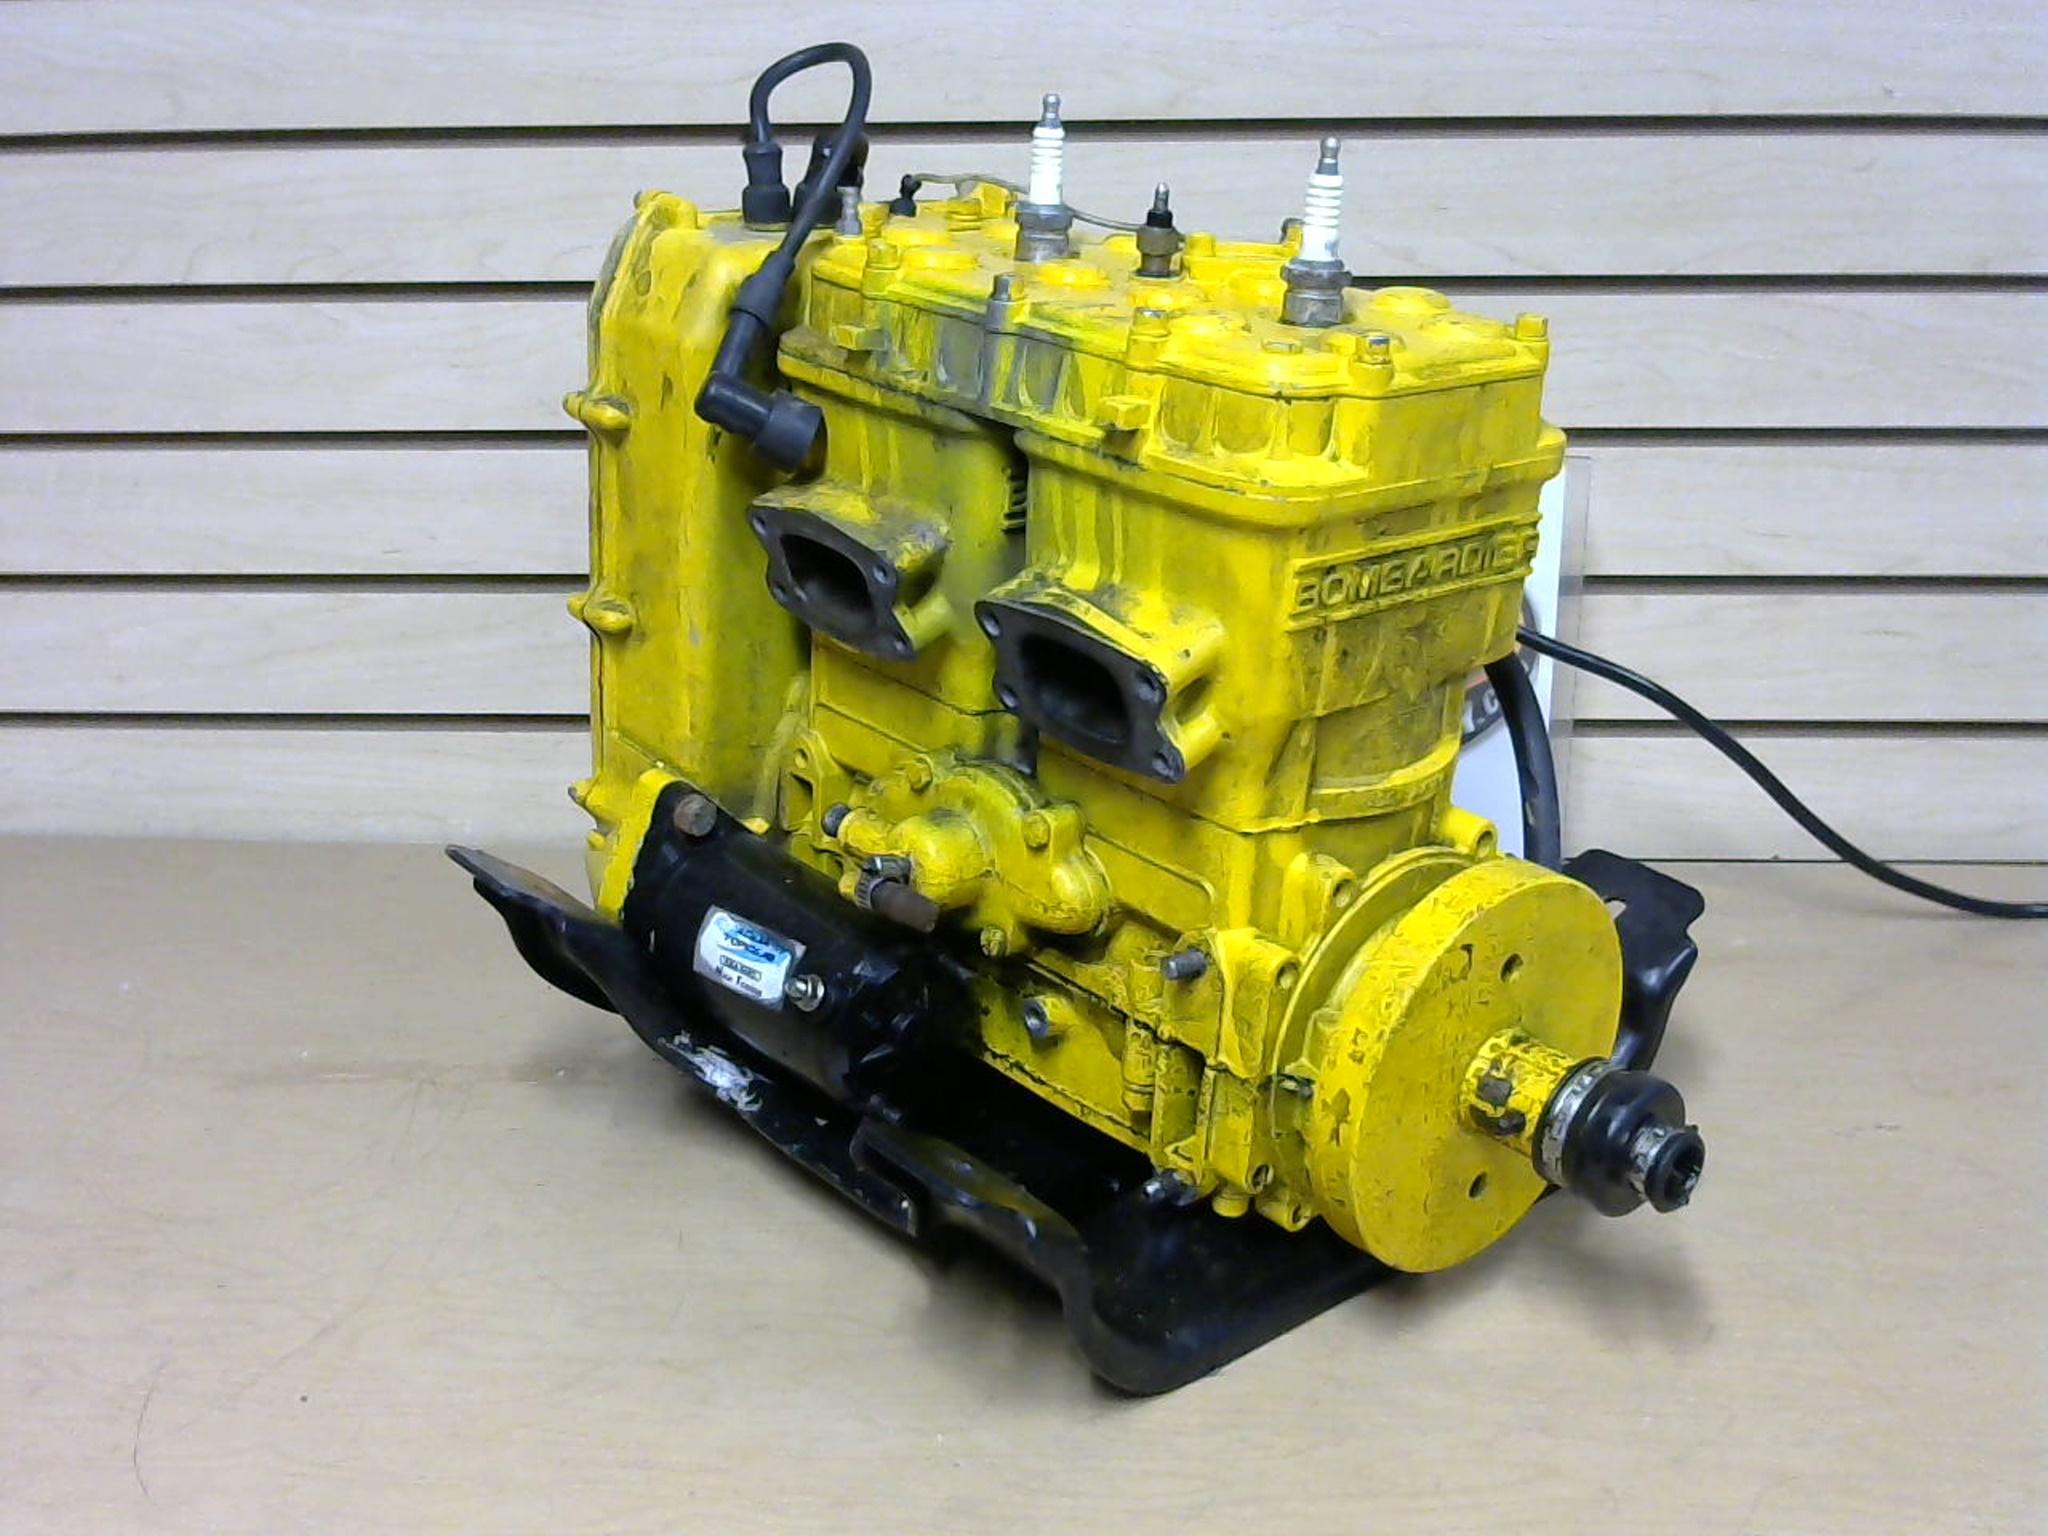 1990 Seadoo GT 587 Engine 130 130 290866599 290995102 290996639 290913286 -  Used Jetski Parts - jetskipartsguy com